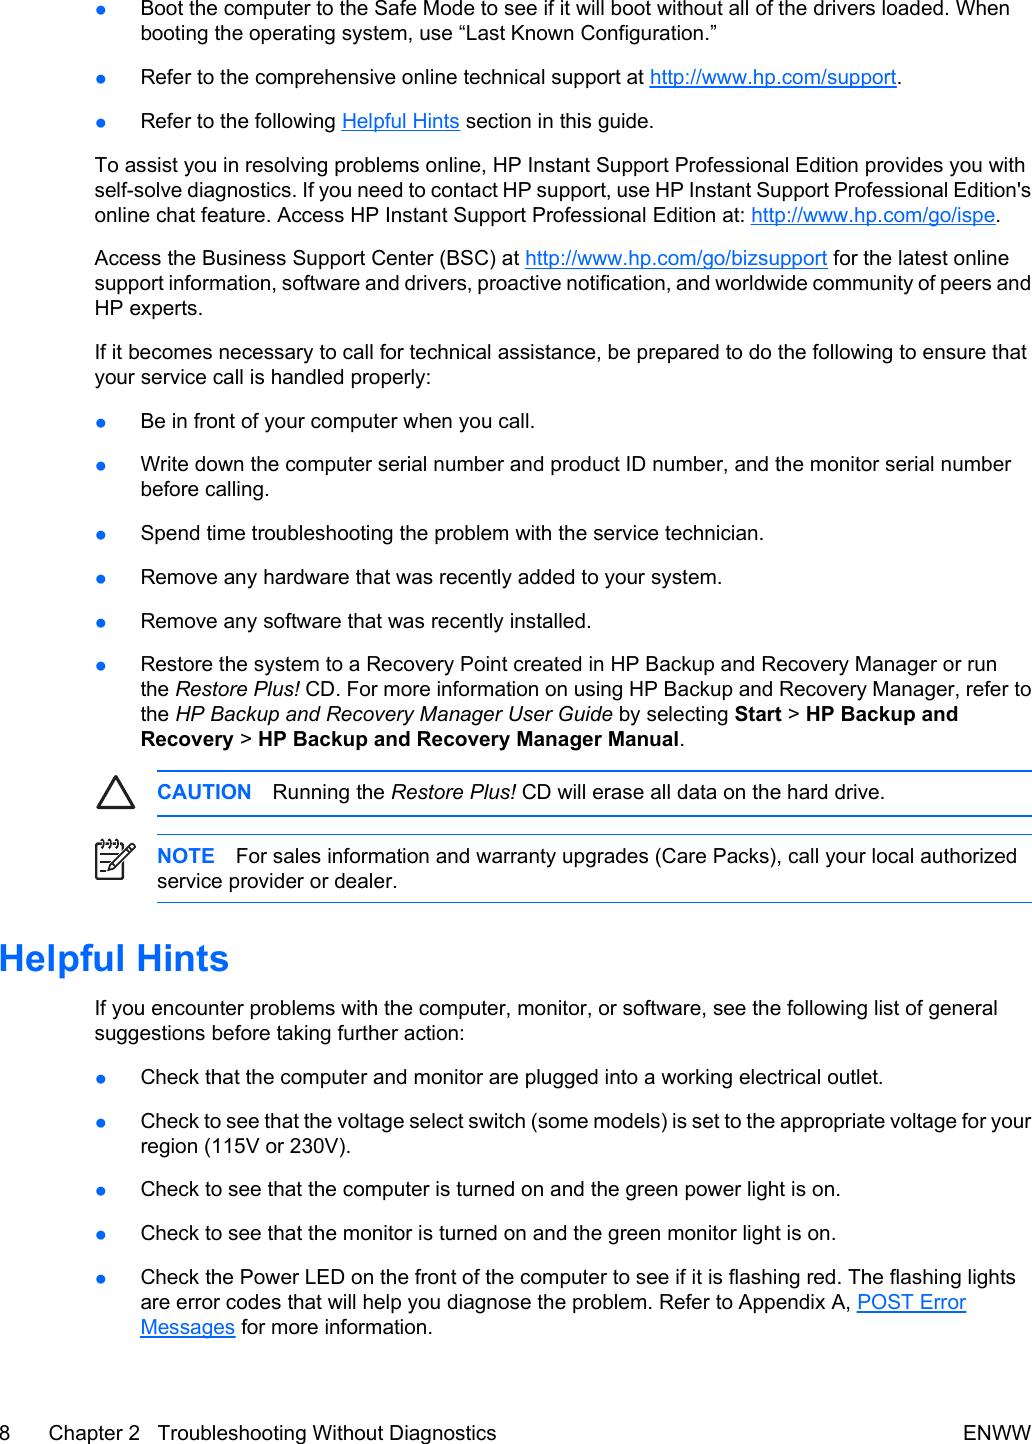 Hp Light Codes